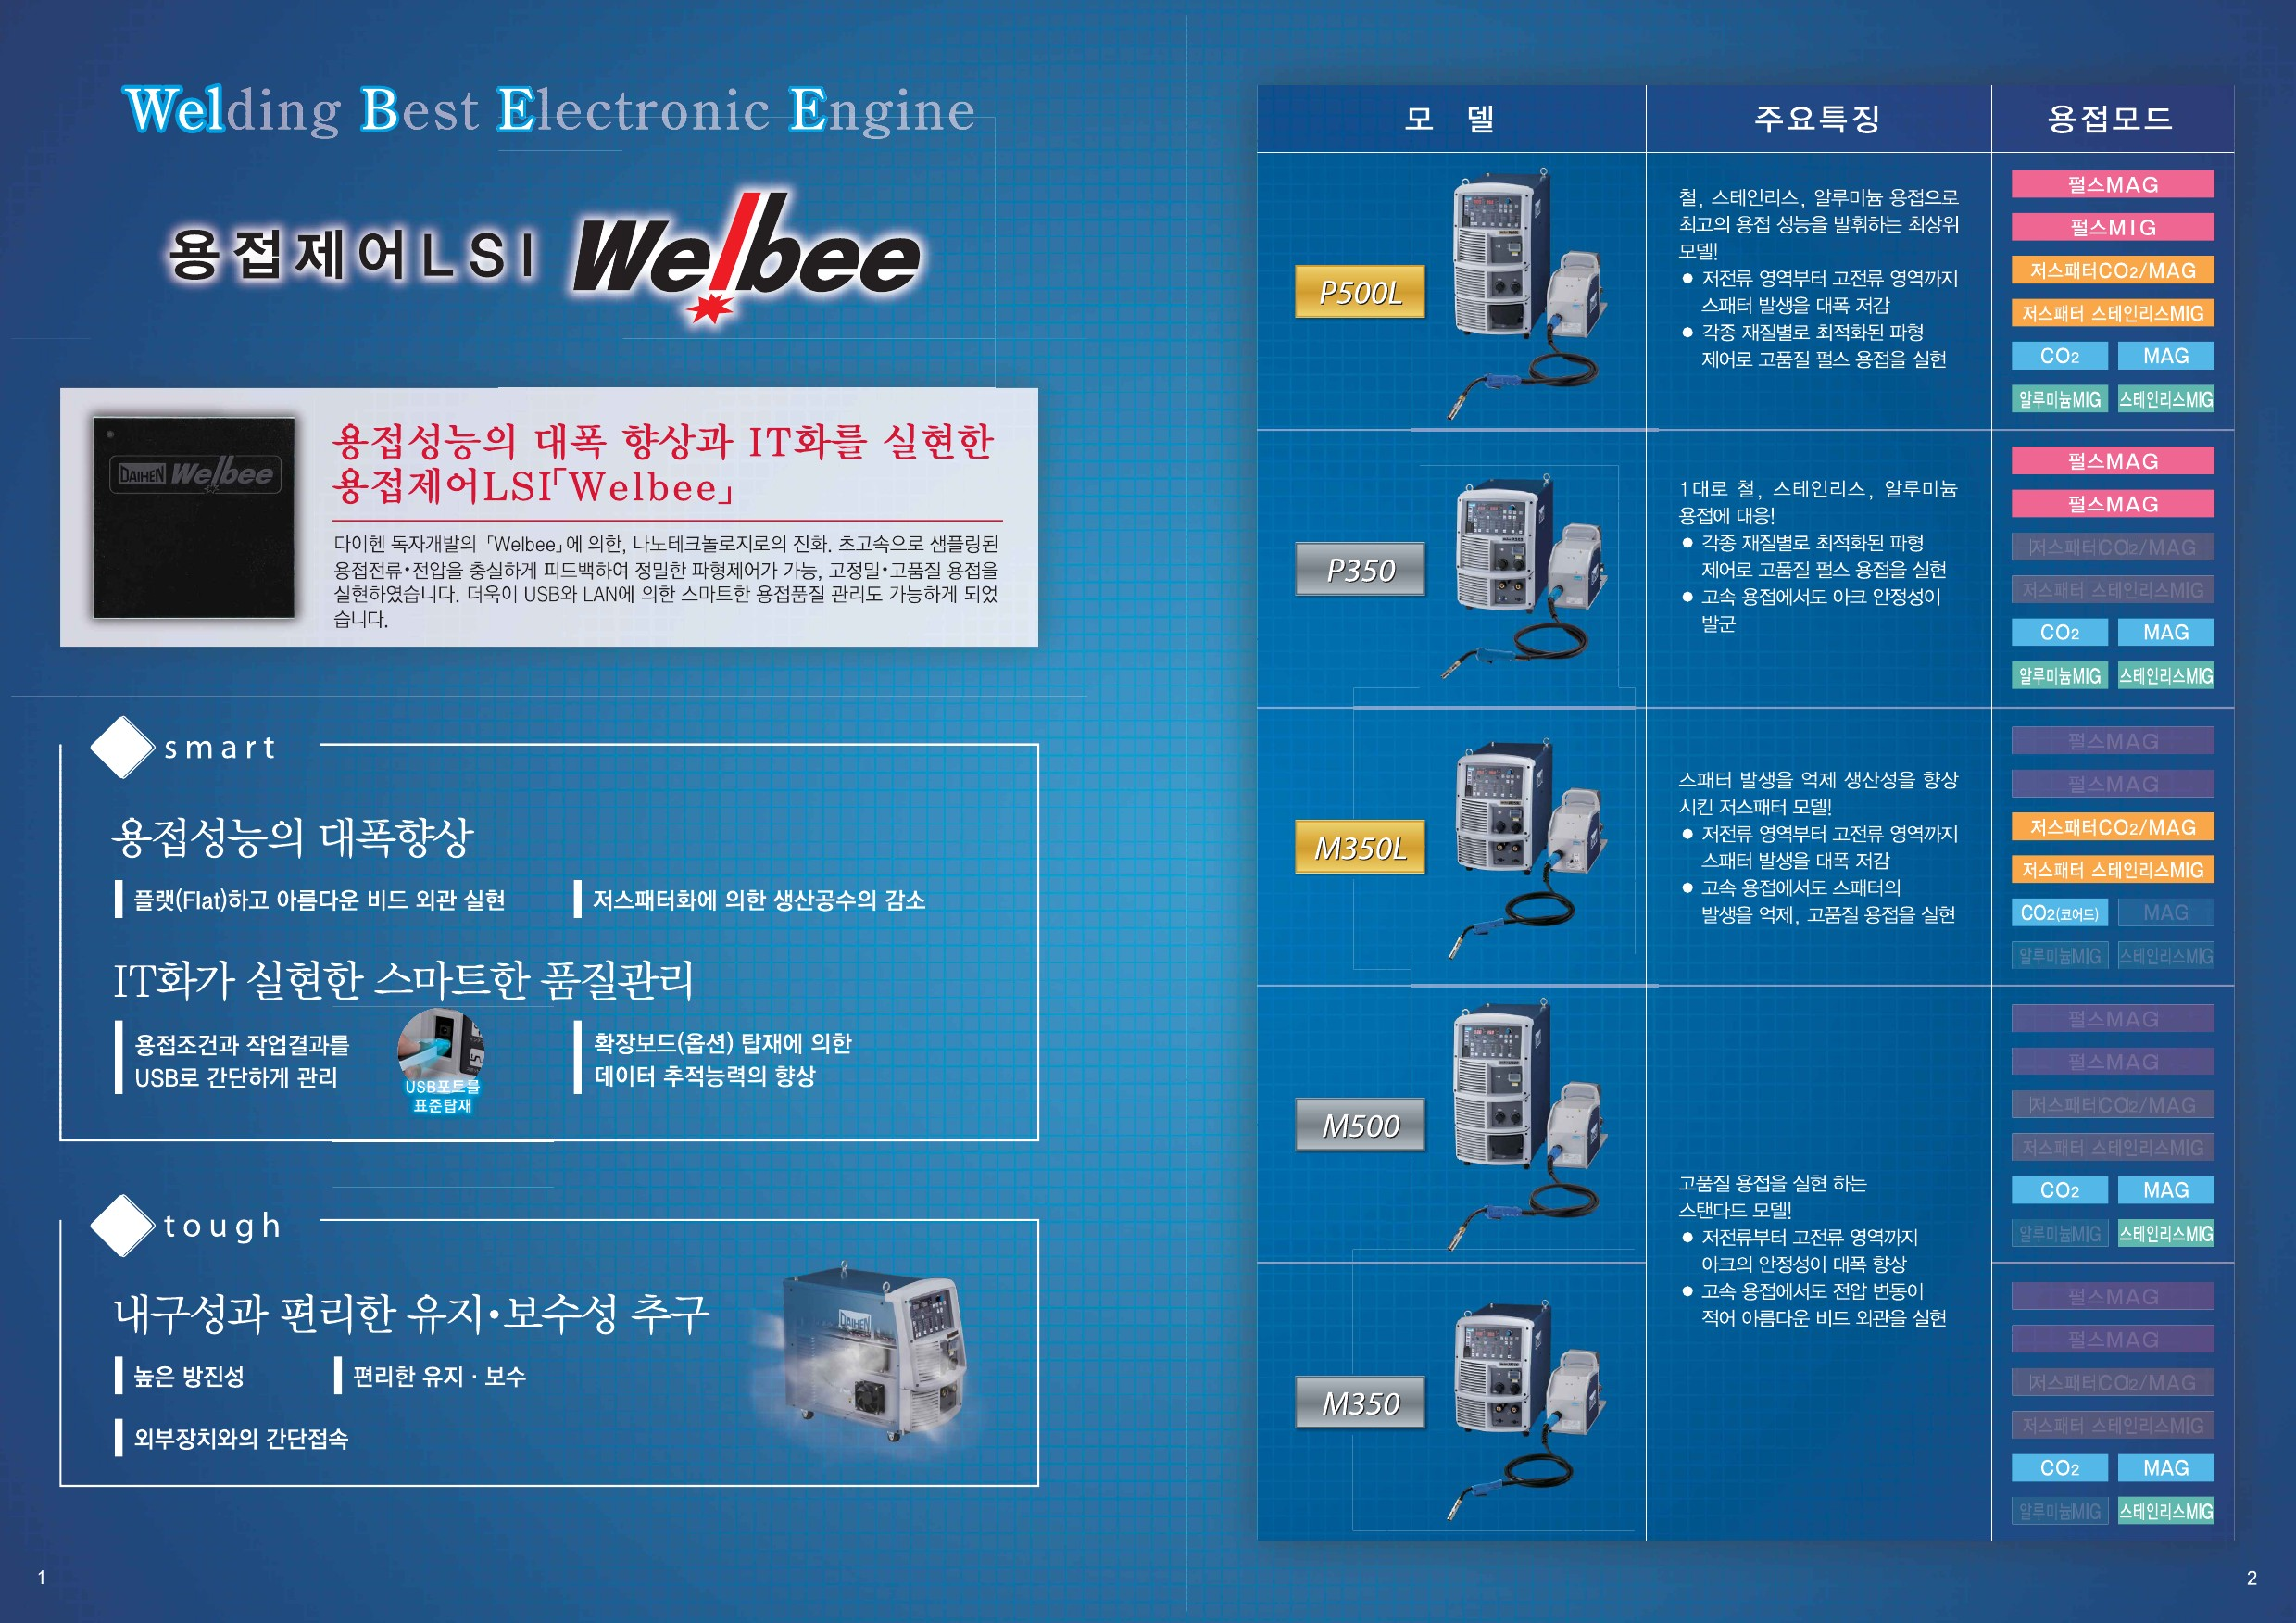 welbee-2.jpg